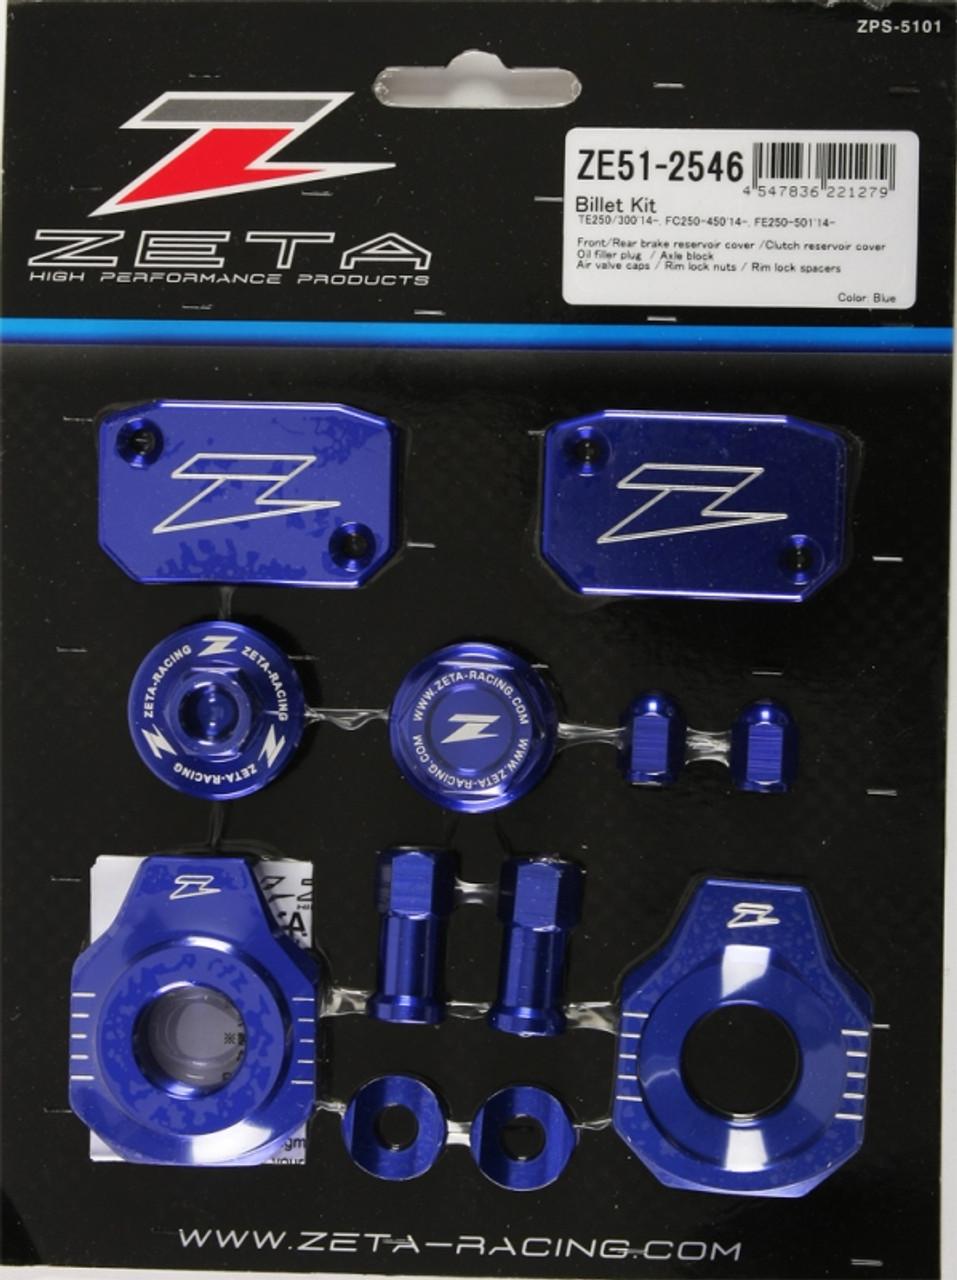 Zeta Billet Kit Blue Anodized Aluminum Husqvarna ZE51-2546